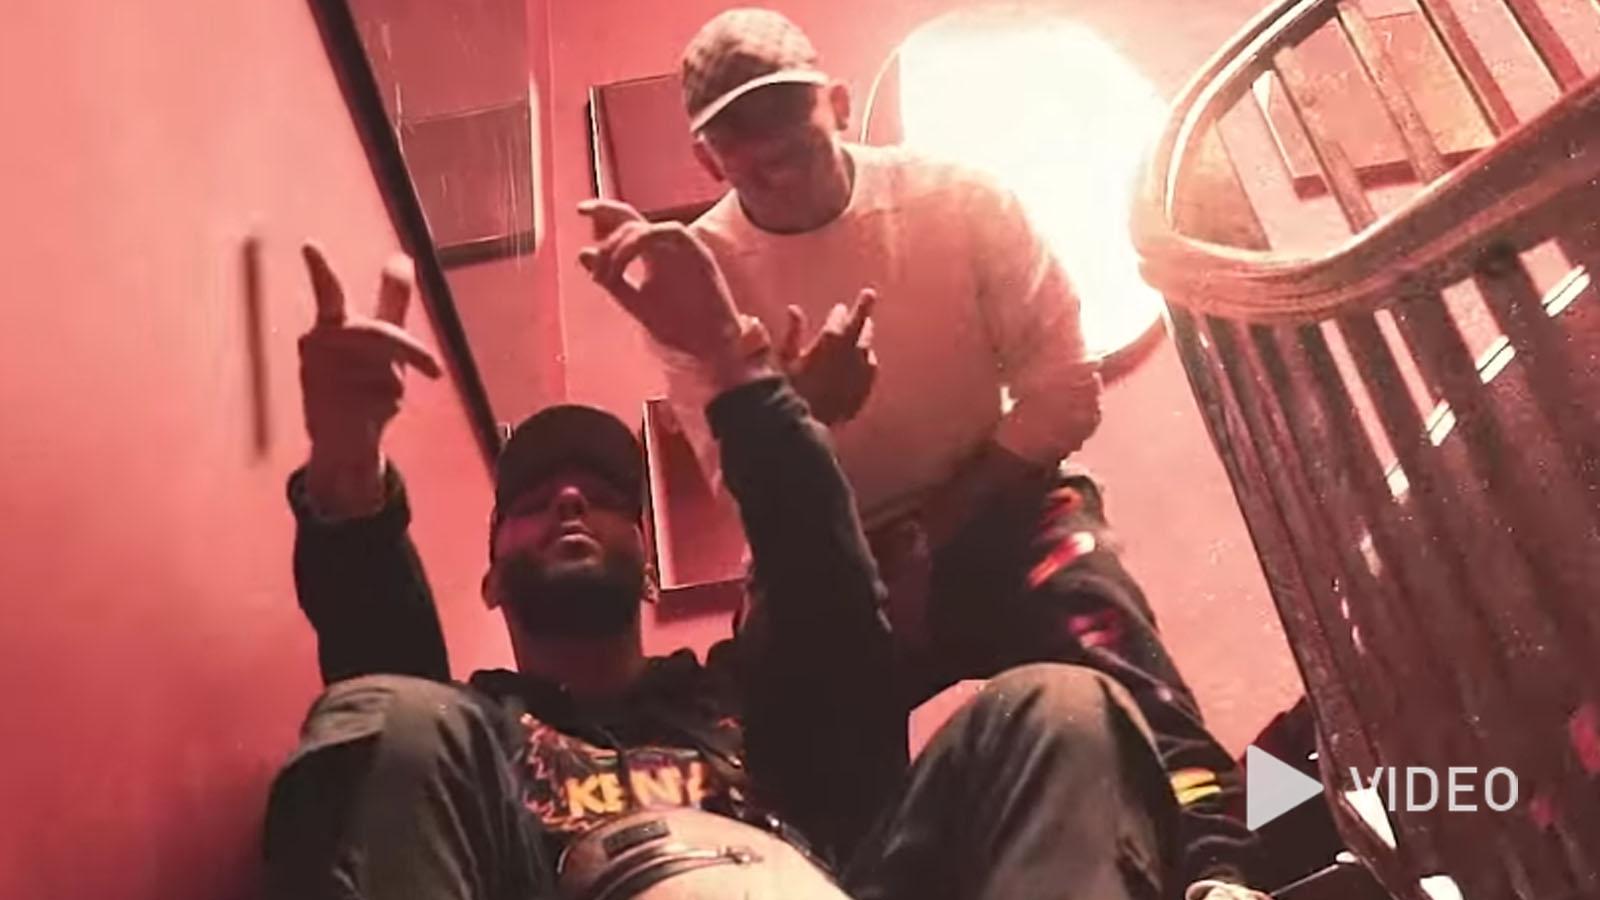 Capital Bra & Samra – Nummer 9 [Video] Hiphop.de